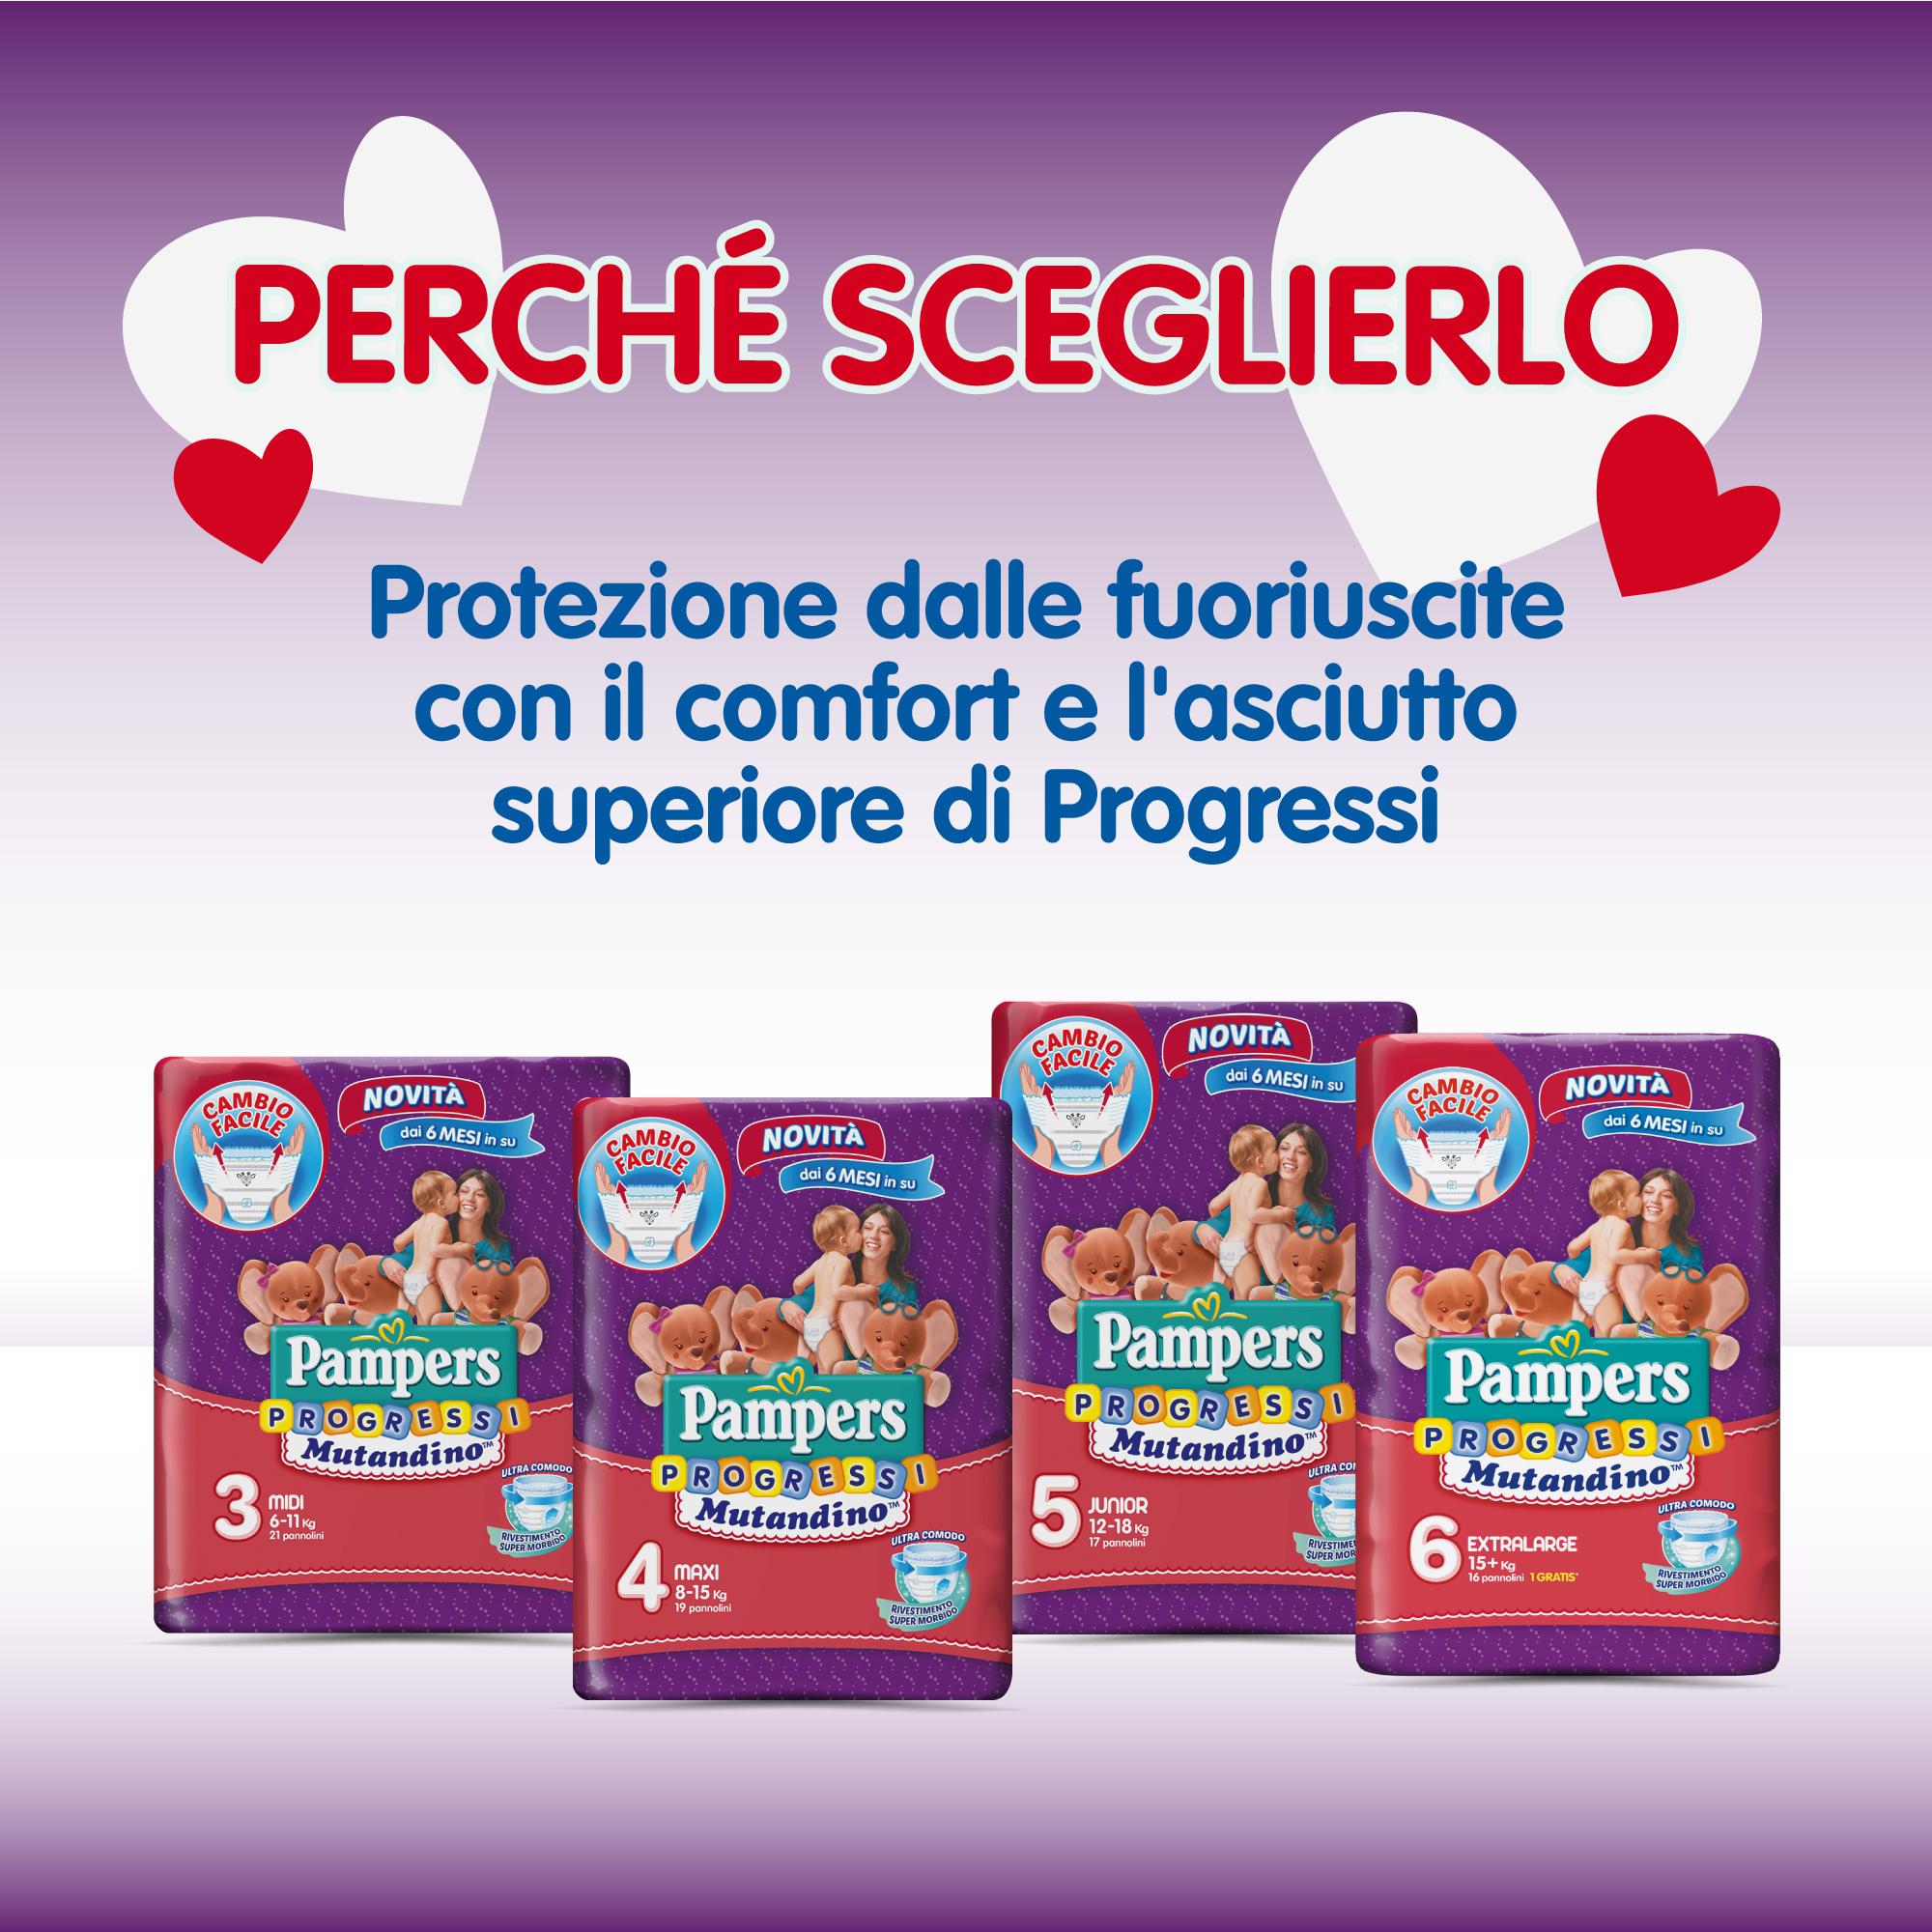 12-18 Kg 976185-Pampers Progressi Mutandino Junior Taglia 5 68 Pannolini